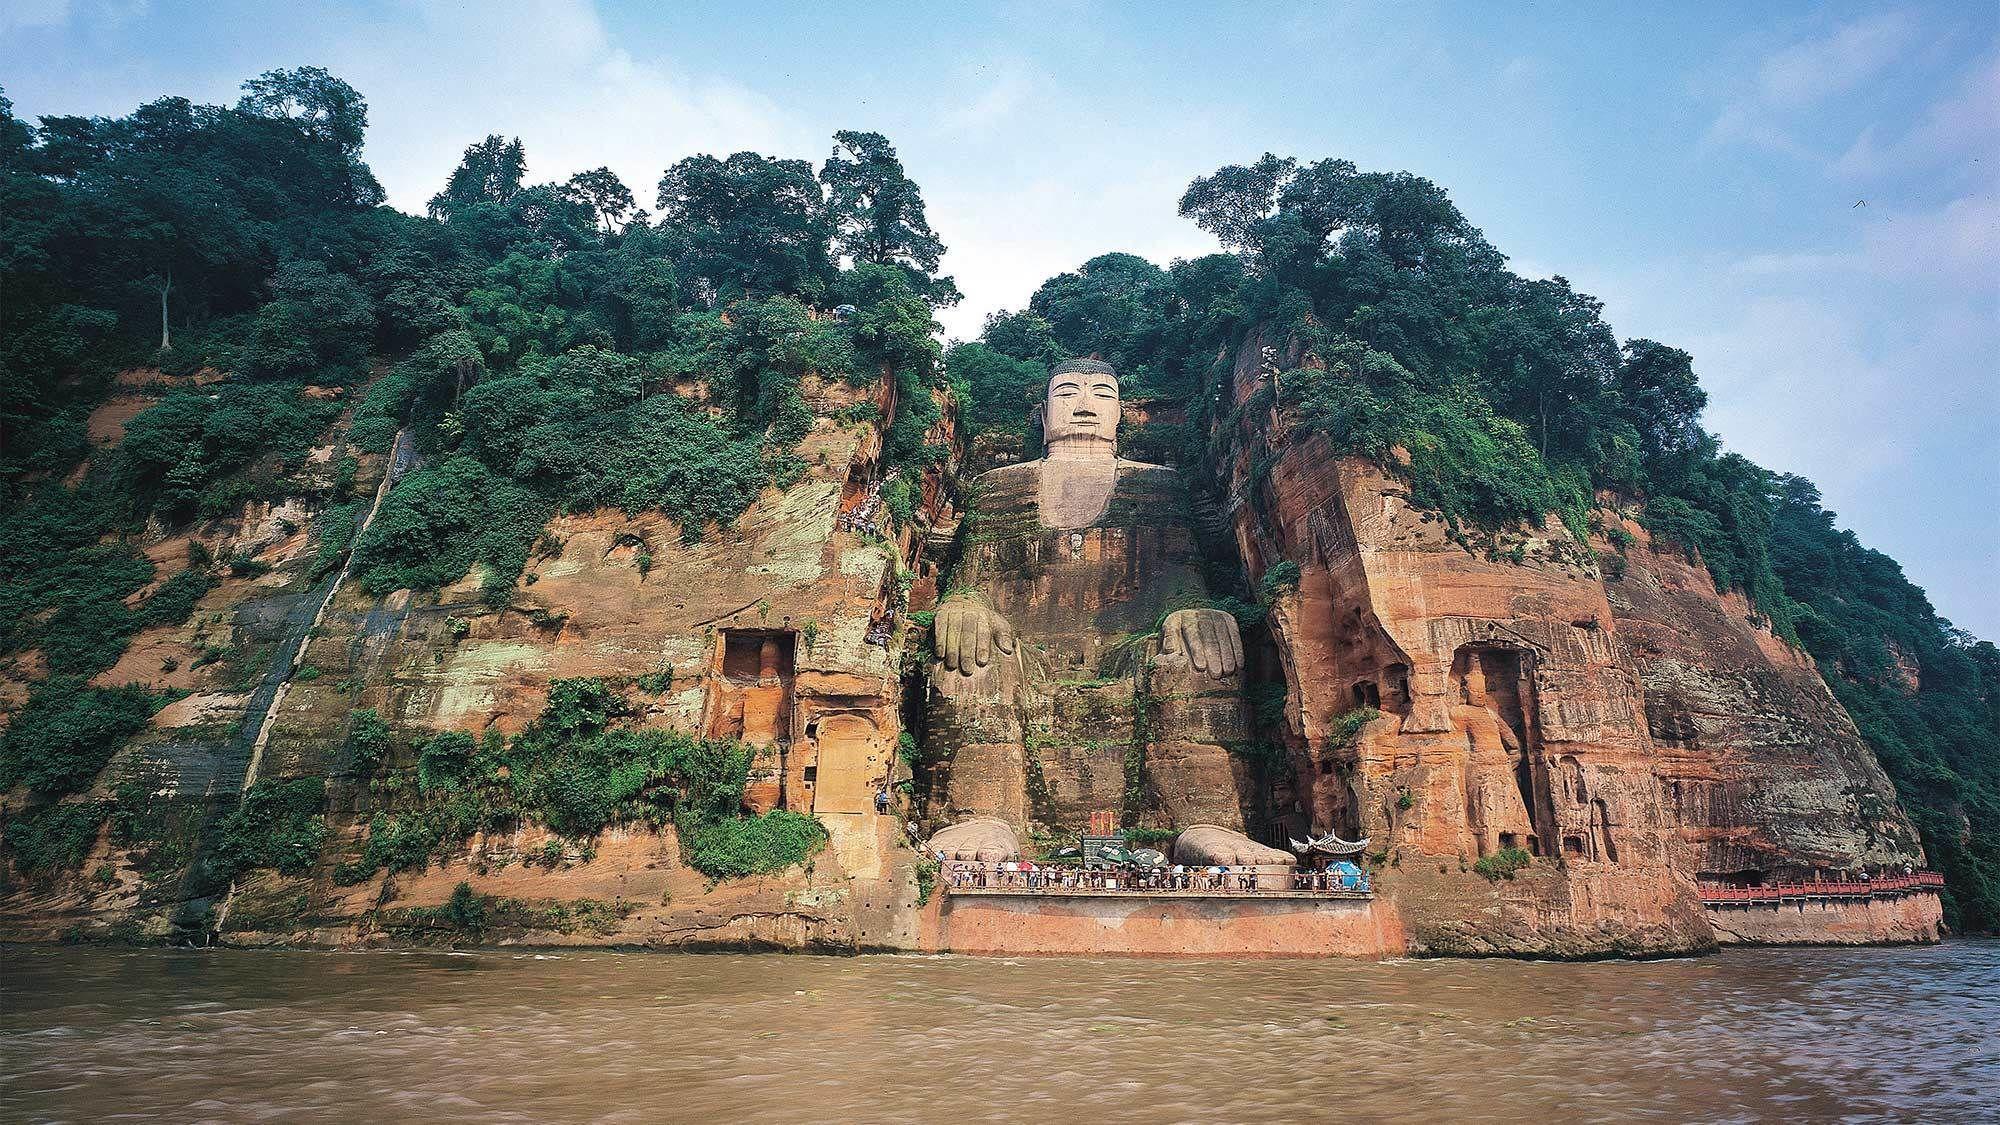 Private Tour of Chengdu Panda Base & Leshan Buddha Statue